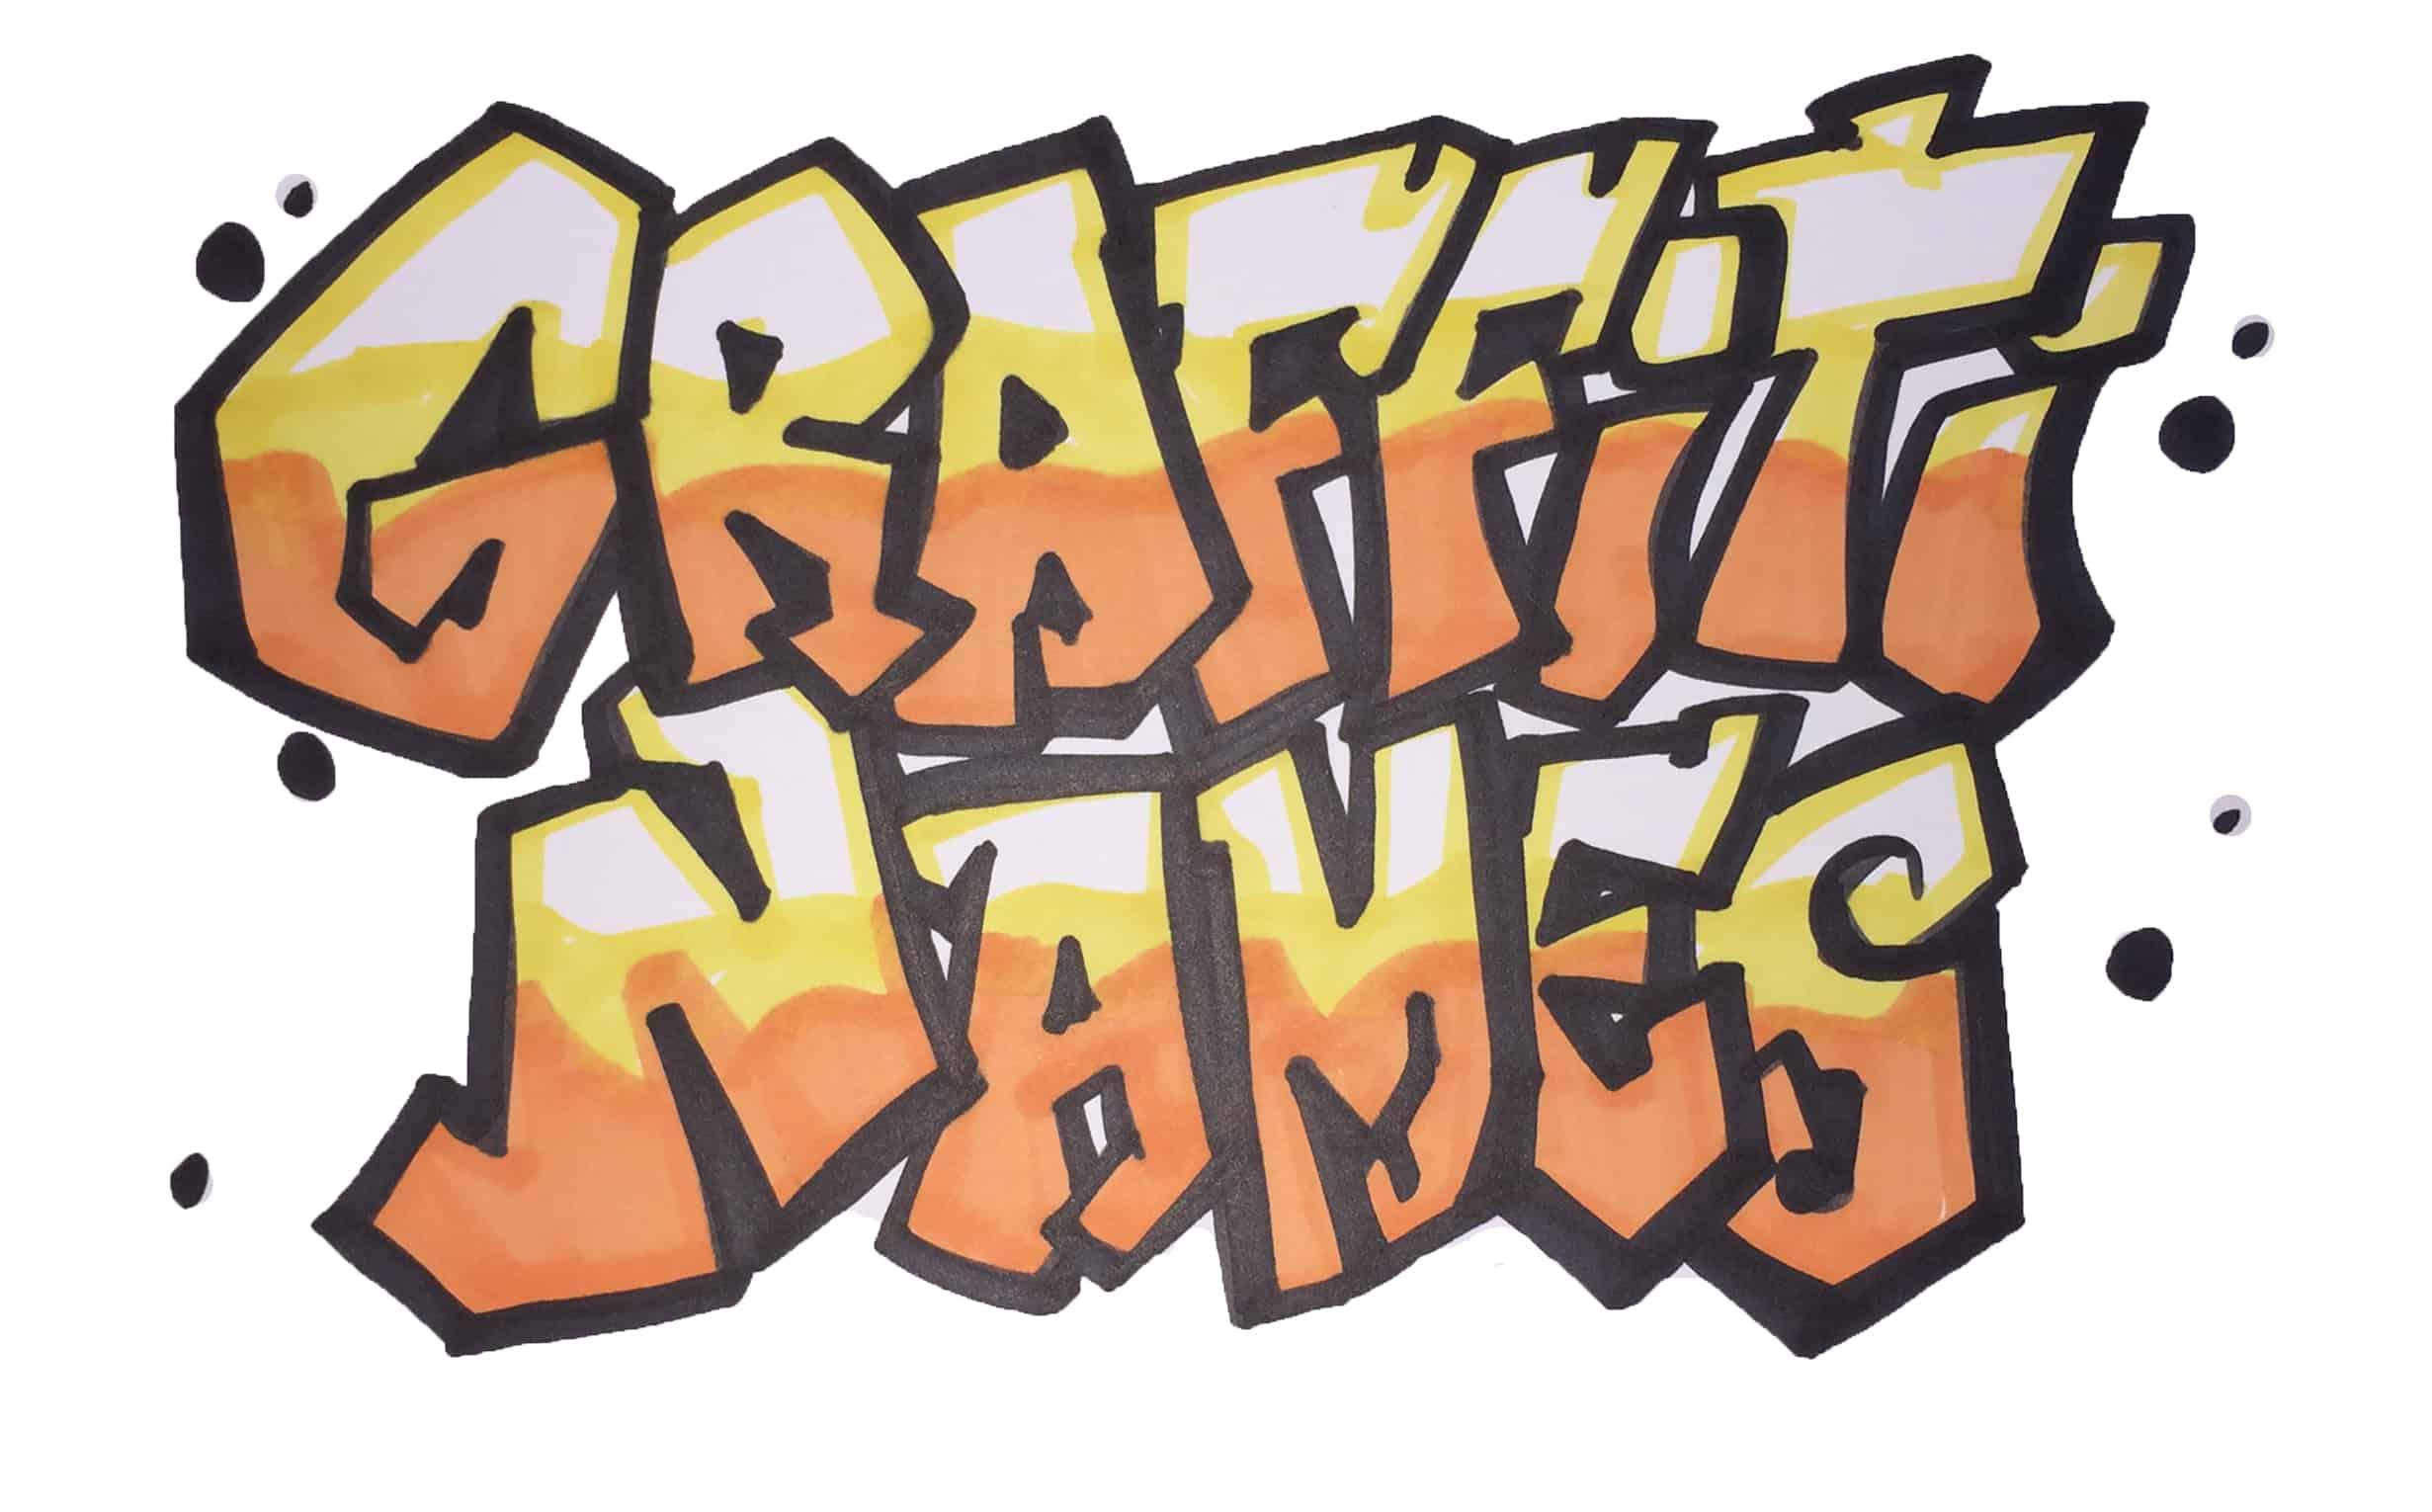 Pencil Drawing Art Names And Artist - animal Pencil Drawing